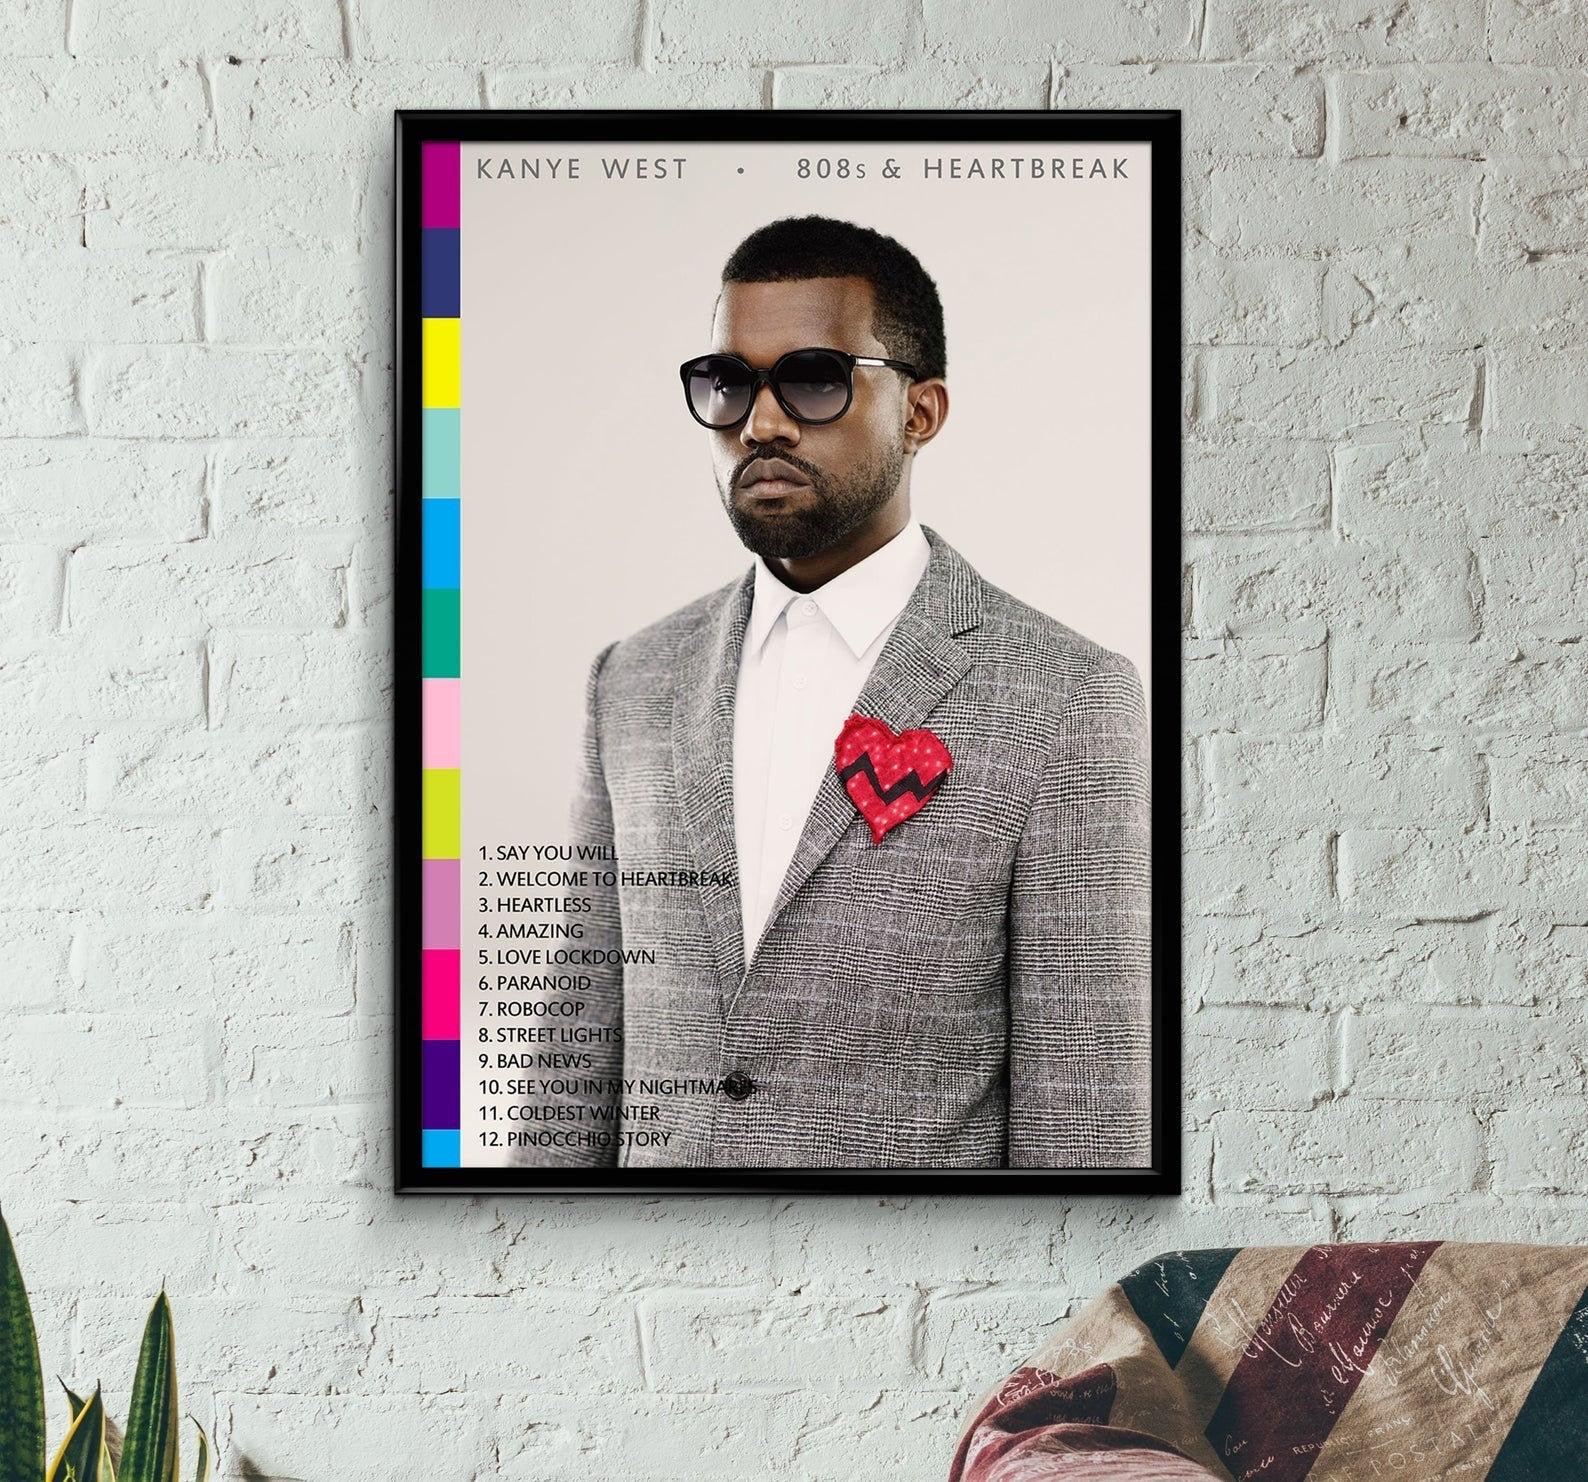 808/'s and Heartbreak Kanye West Art New Print 27x40 24x36 Poster C-921